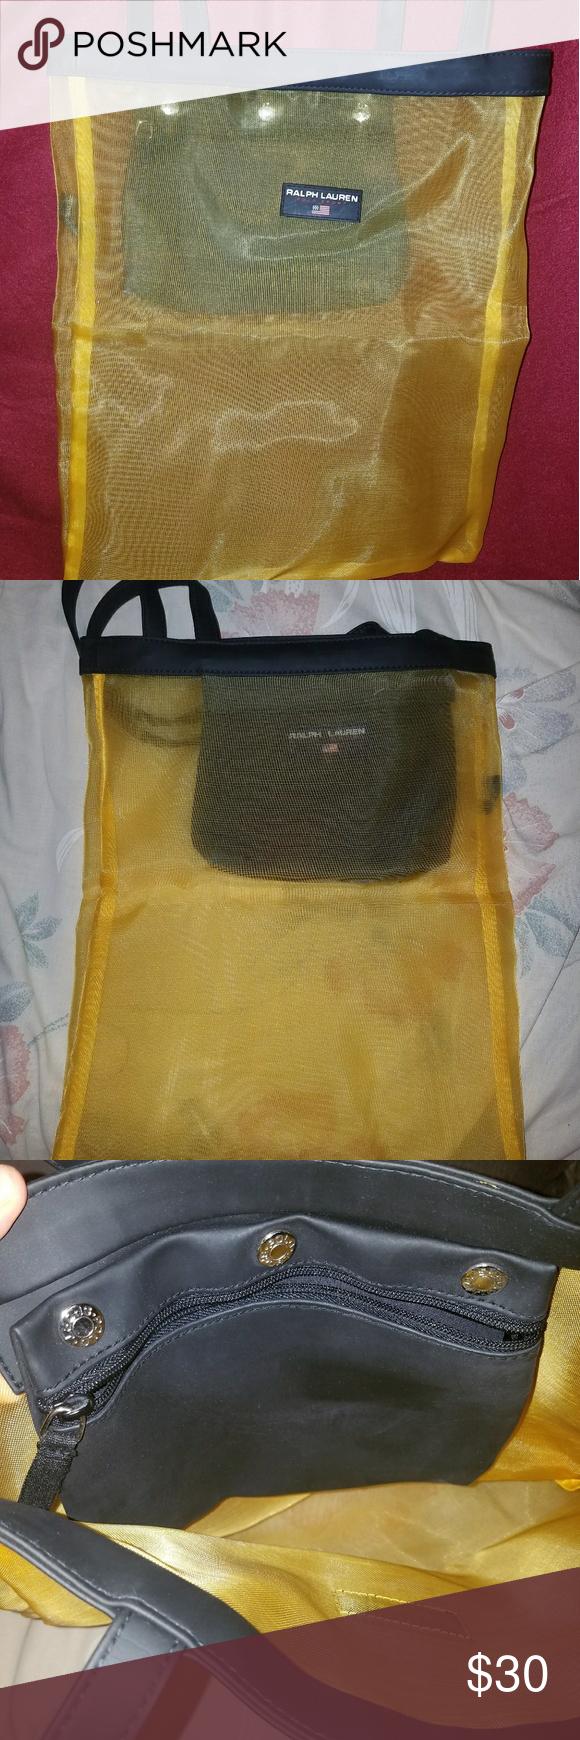 1df70f6bbd Ralph Lauren Polo Sport Mesh Bag   Tote This is a Ralph Lauren Polo Sport  yellow